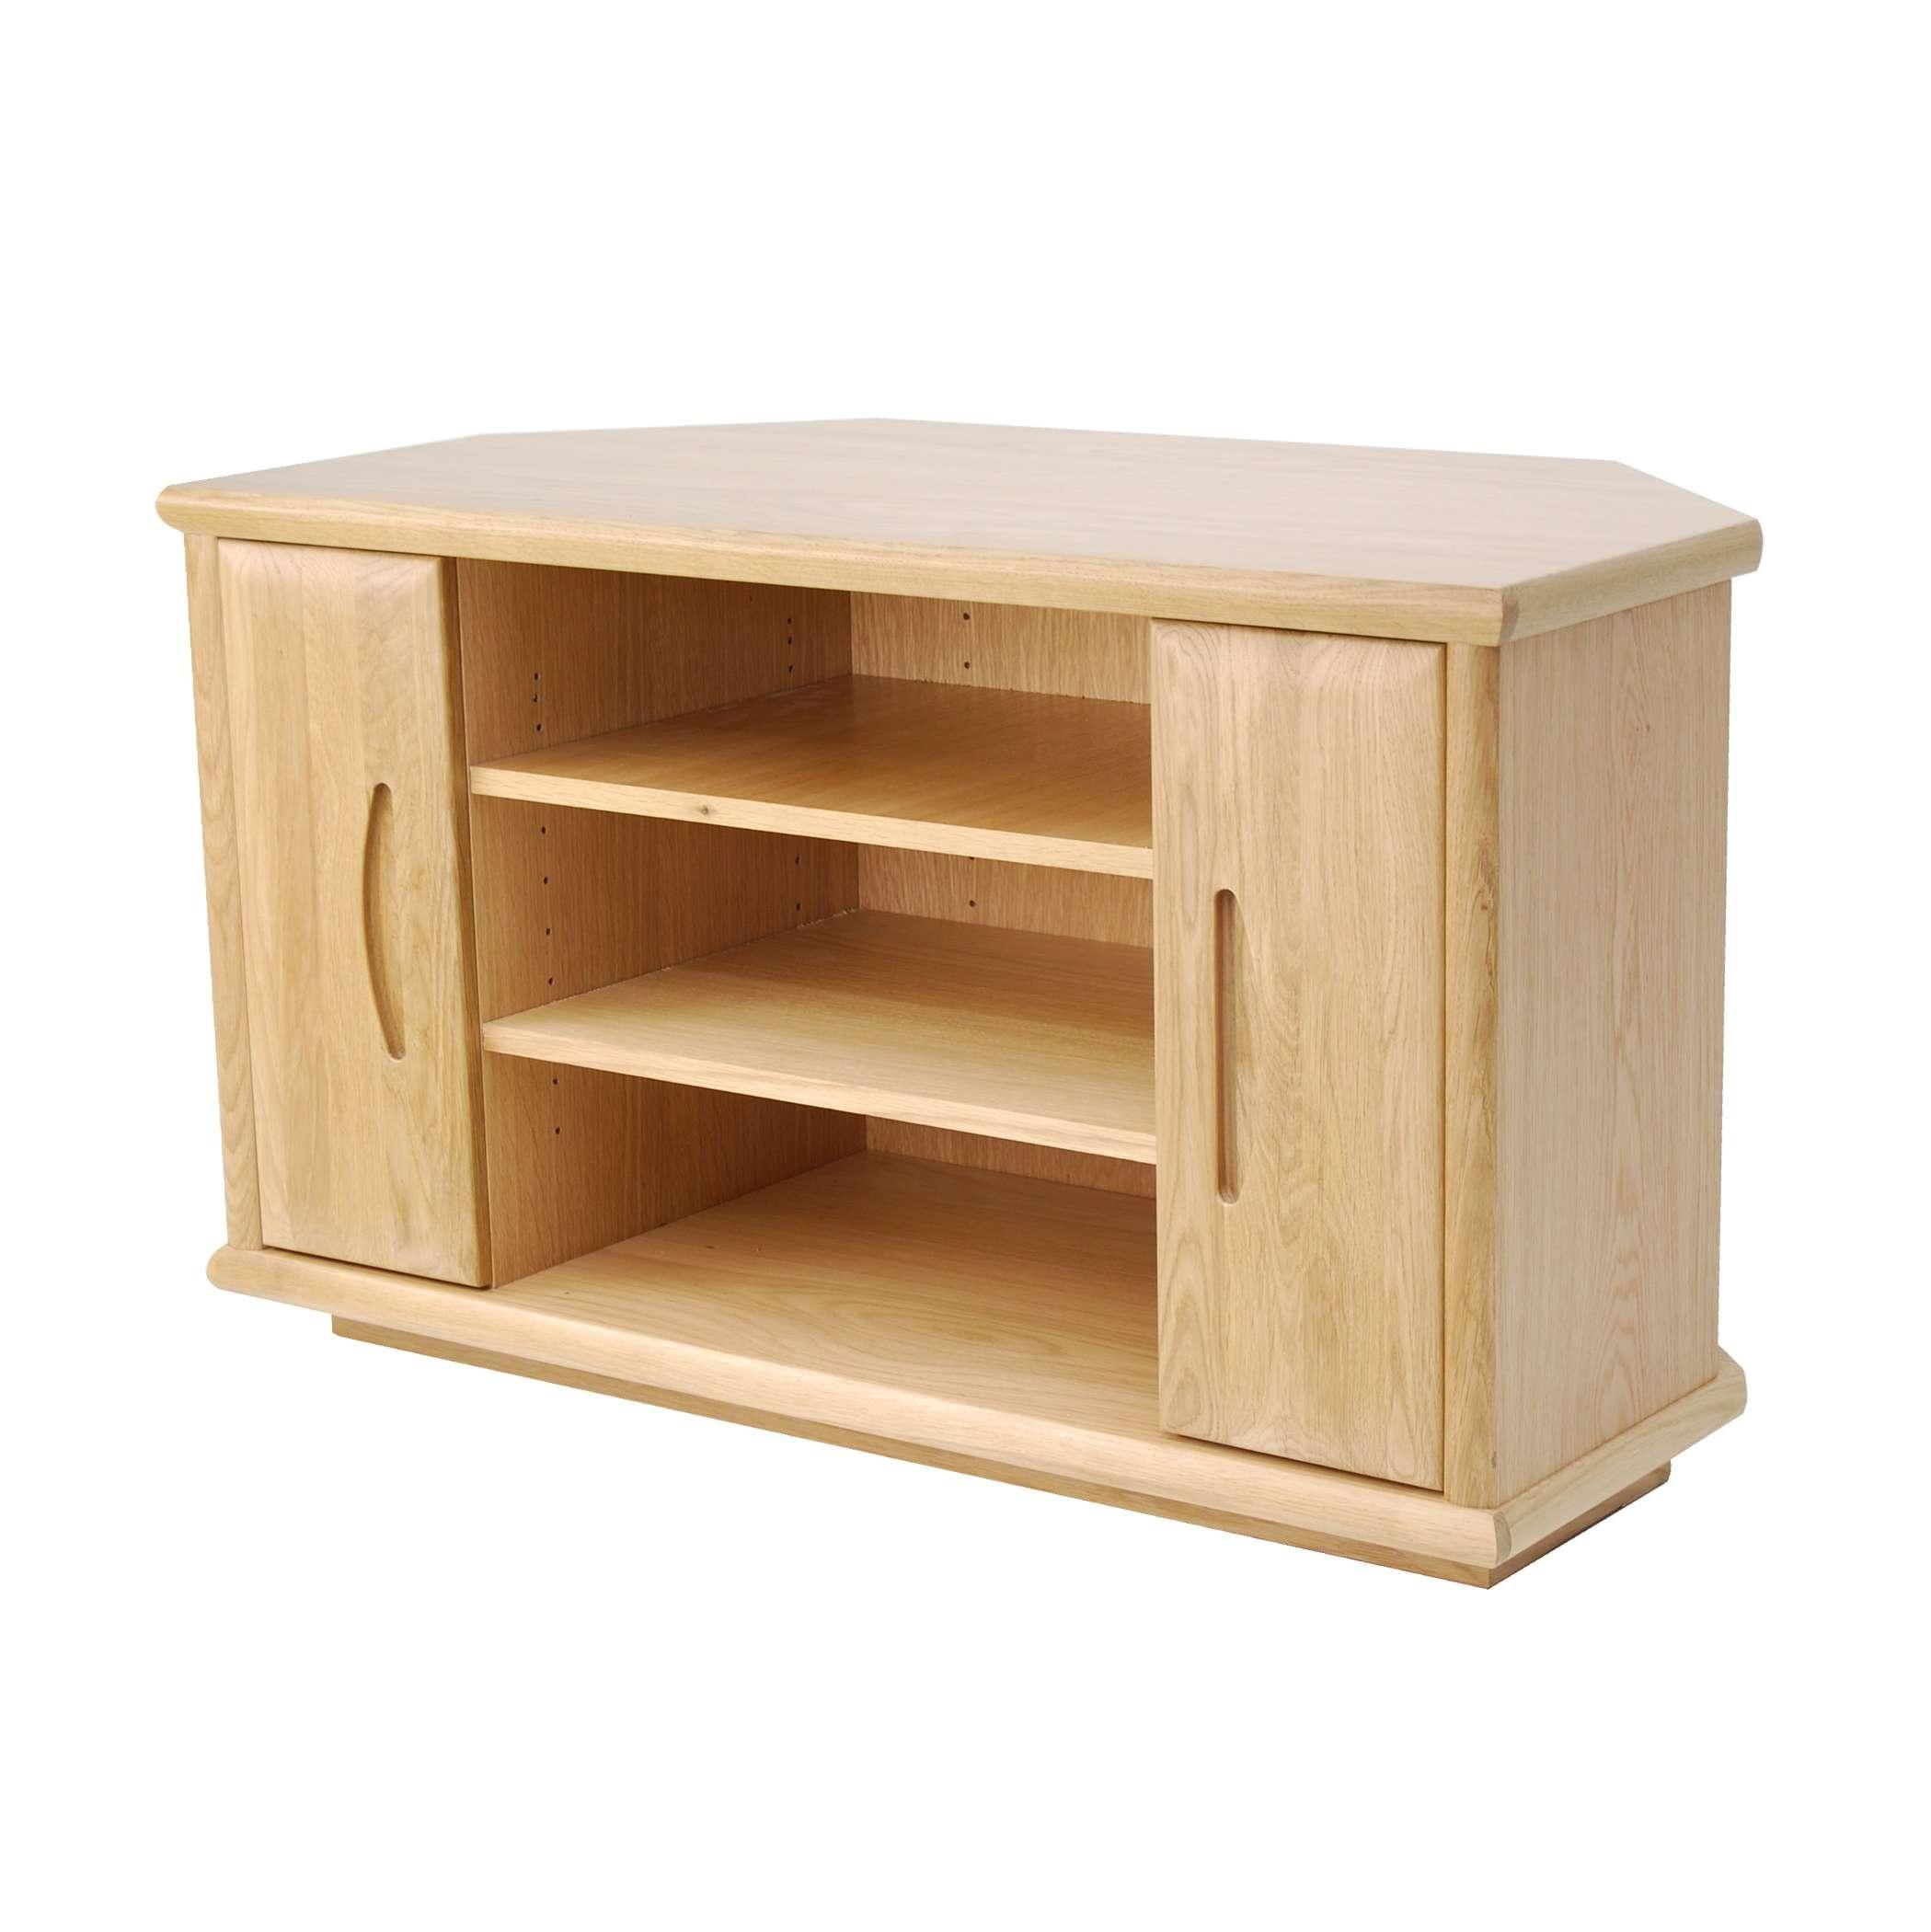 Oak Corner Tv Stand | Gola Furniture Uk With Regard To Oak Corner Tv Stands (View 9 of 15)